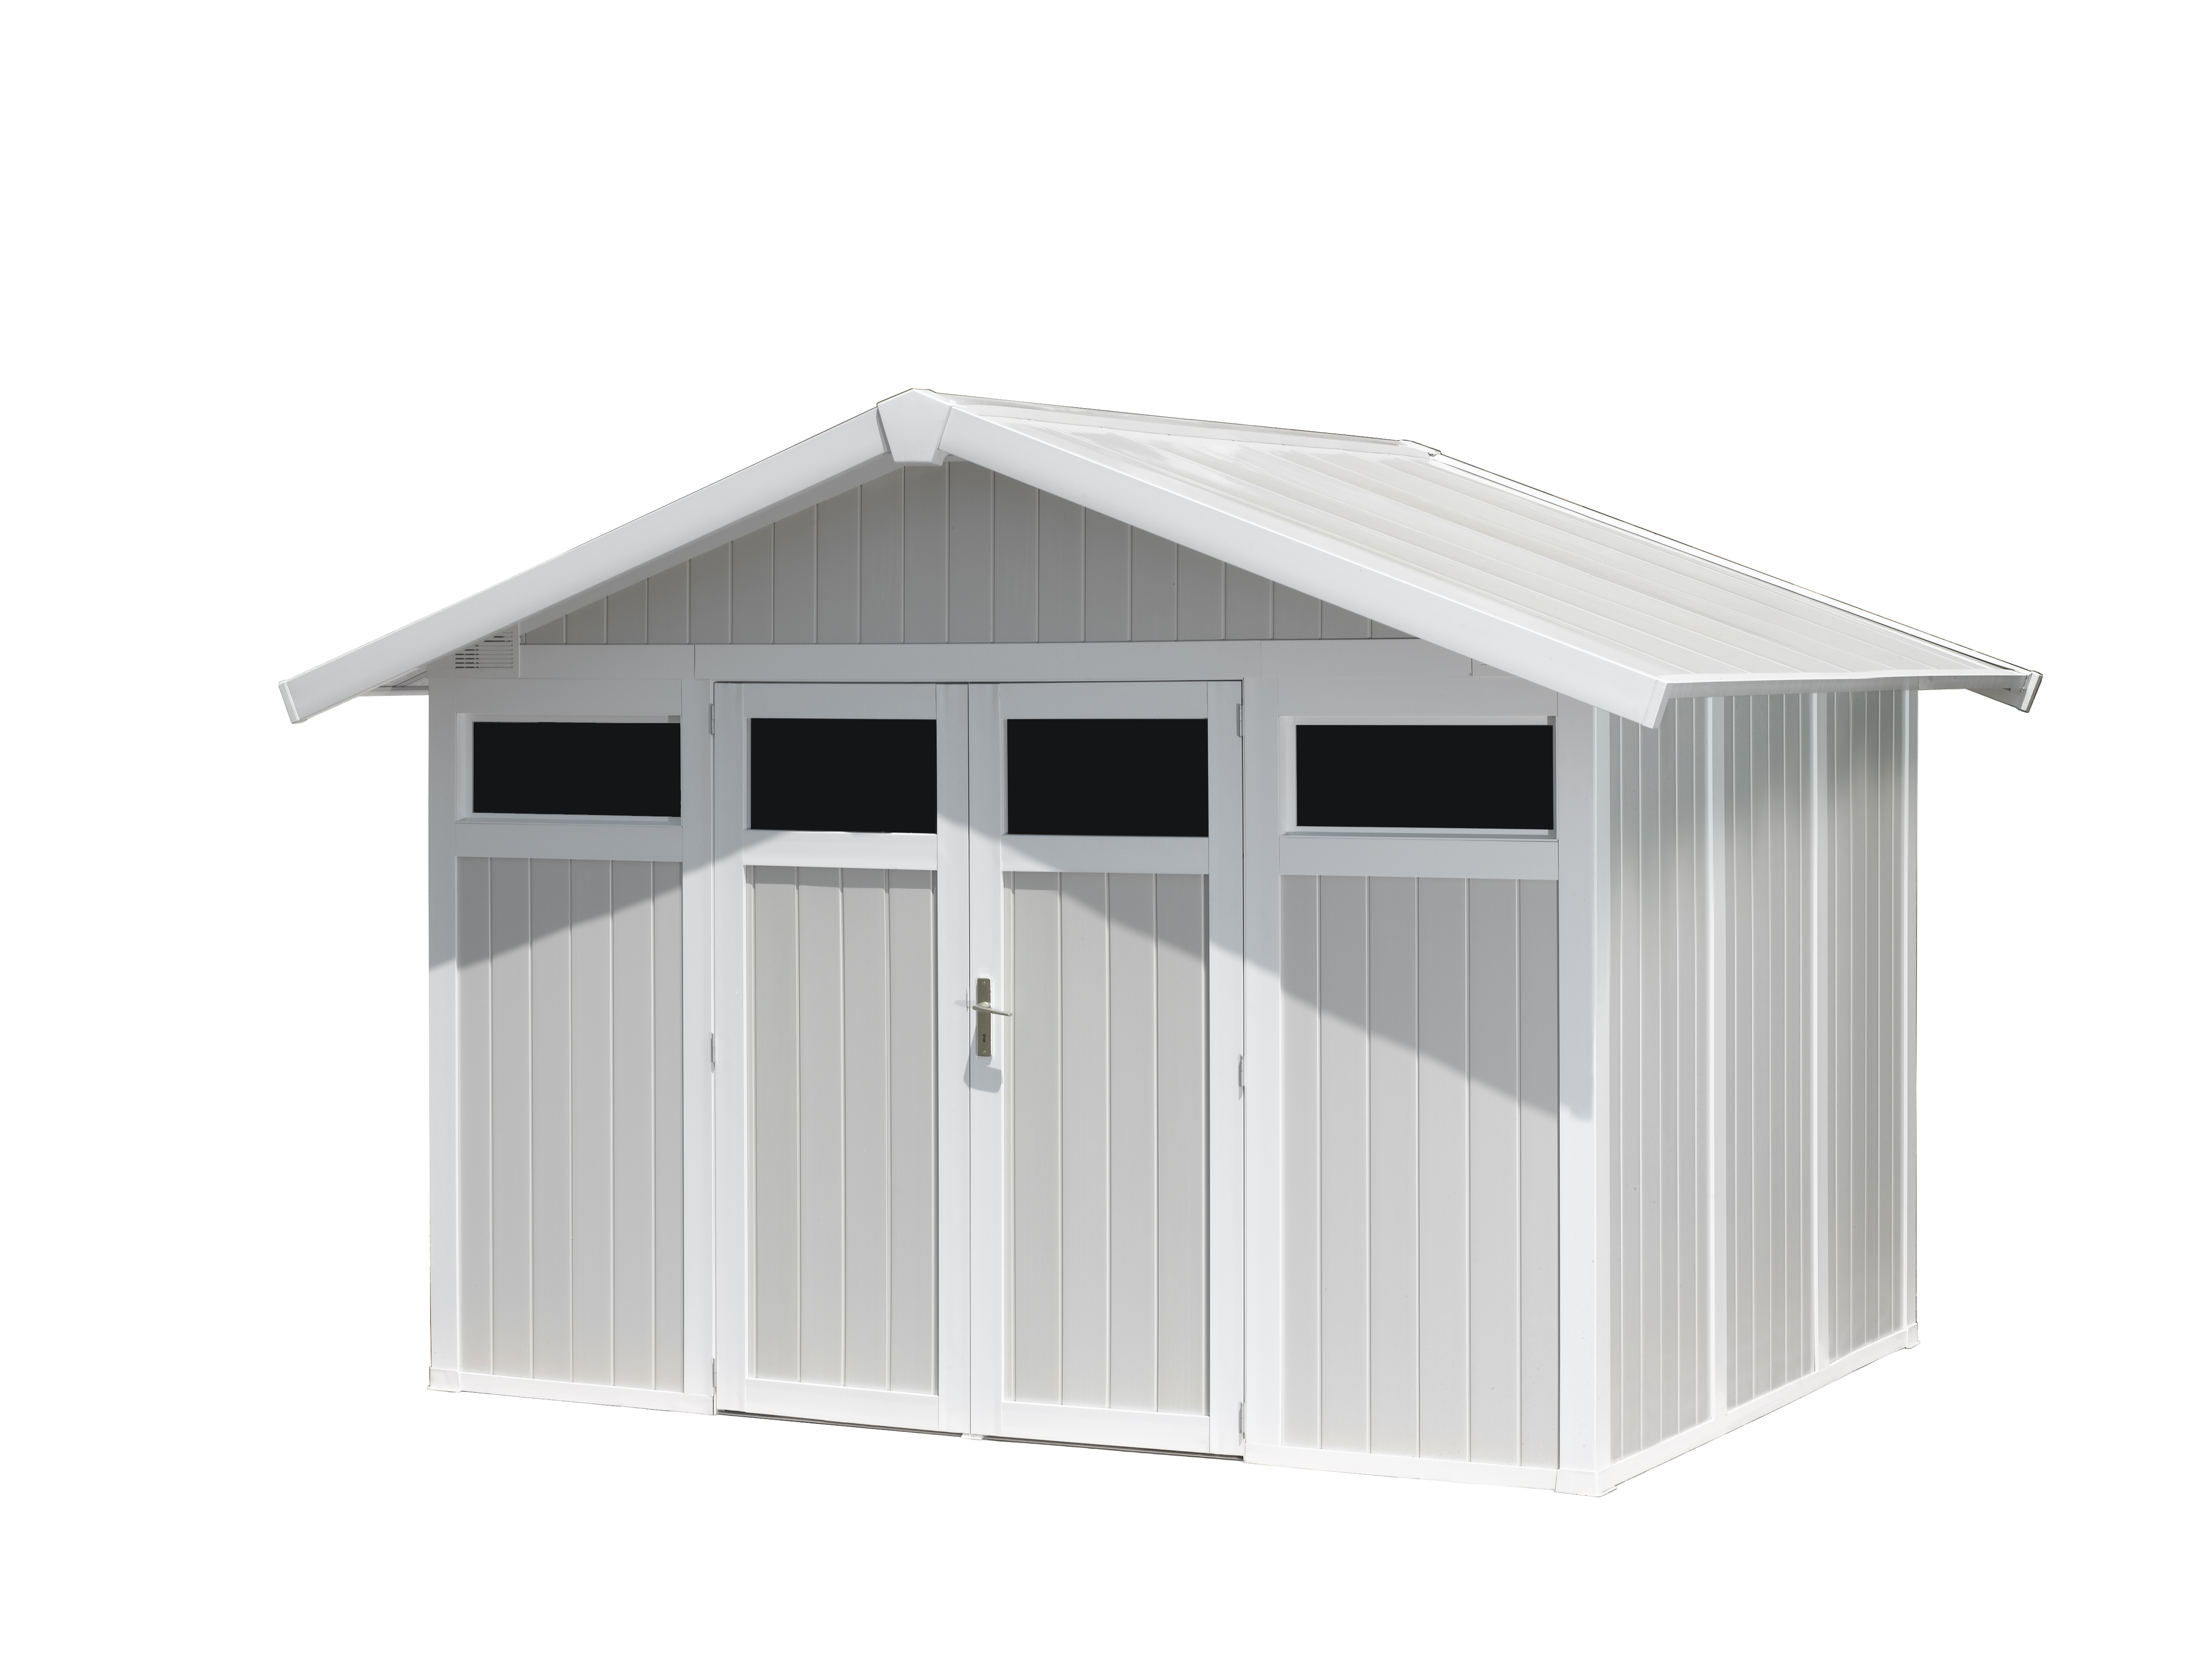 Utility Garden Shed 7,5 M² | Grosfillex destiné Abri Jardin Grosfillex